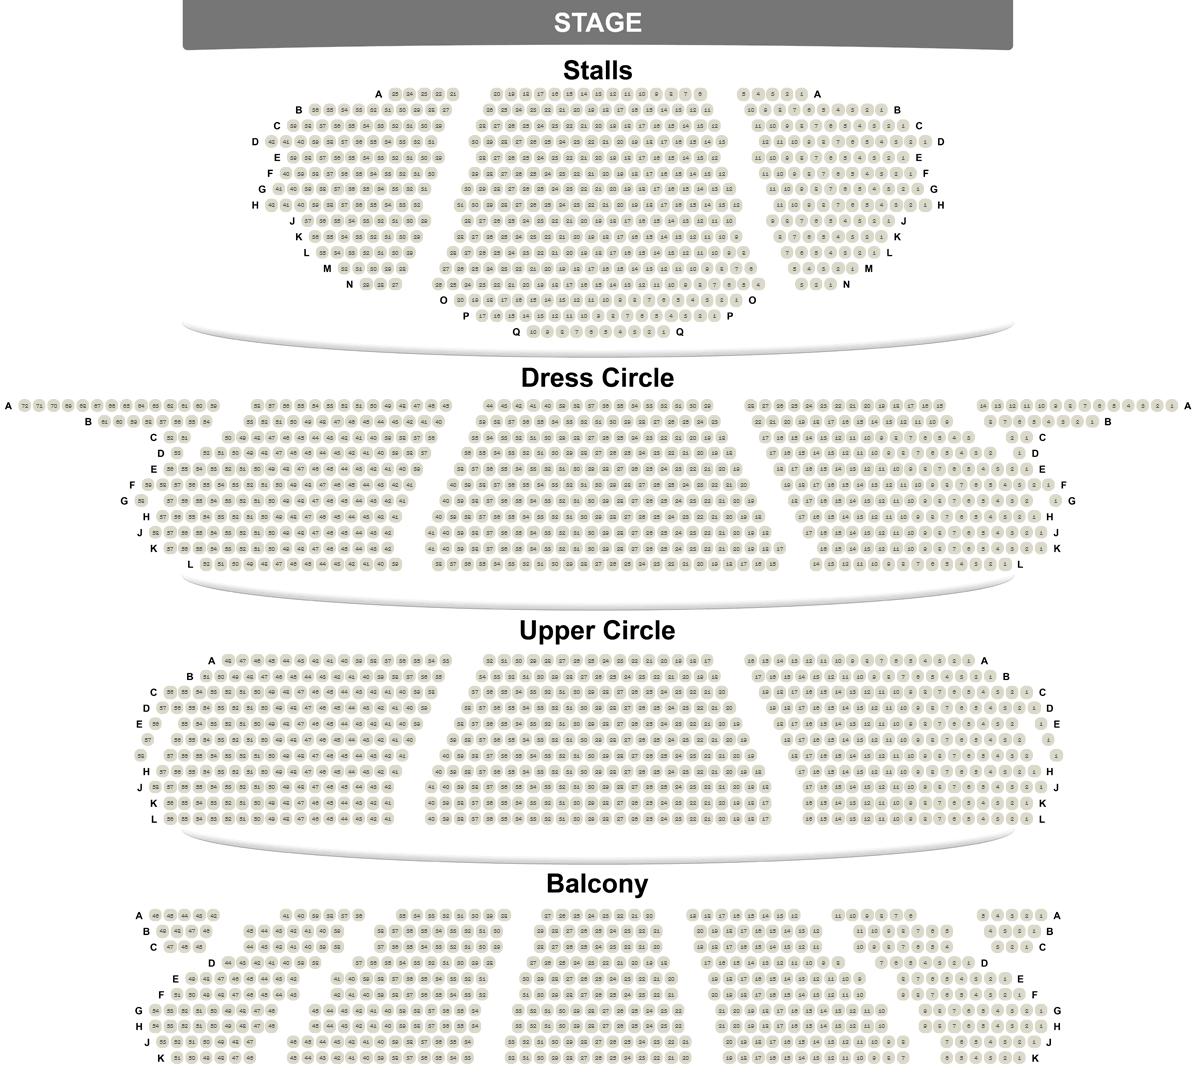 The London Coliseum seating plan